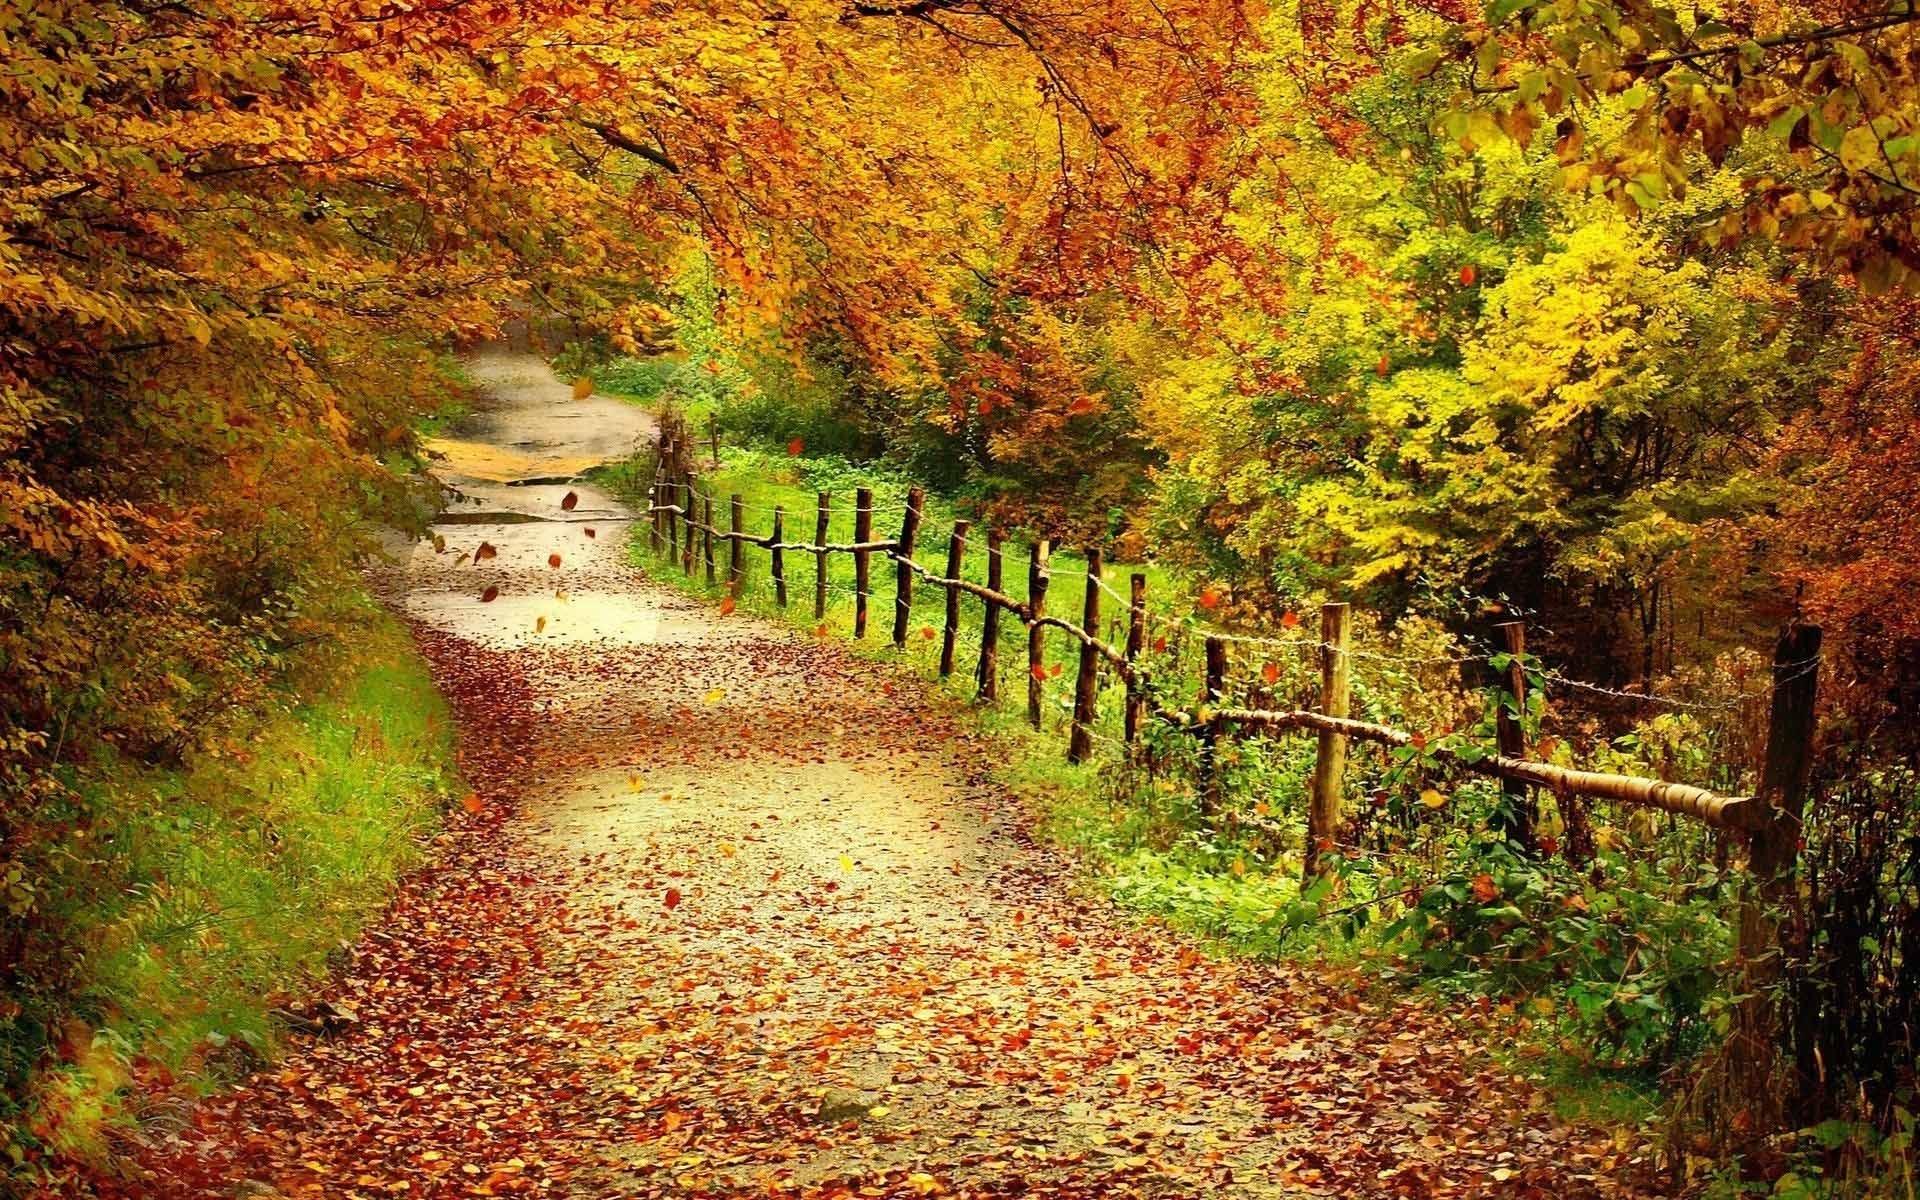 desktop wallpapers fall colors hd high. - media file | pixelstalk